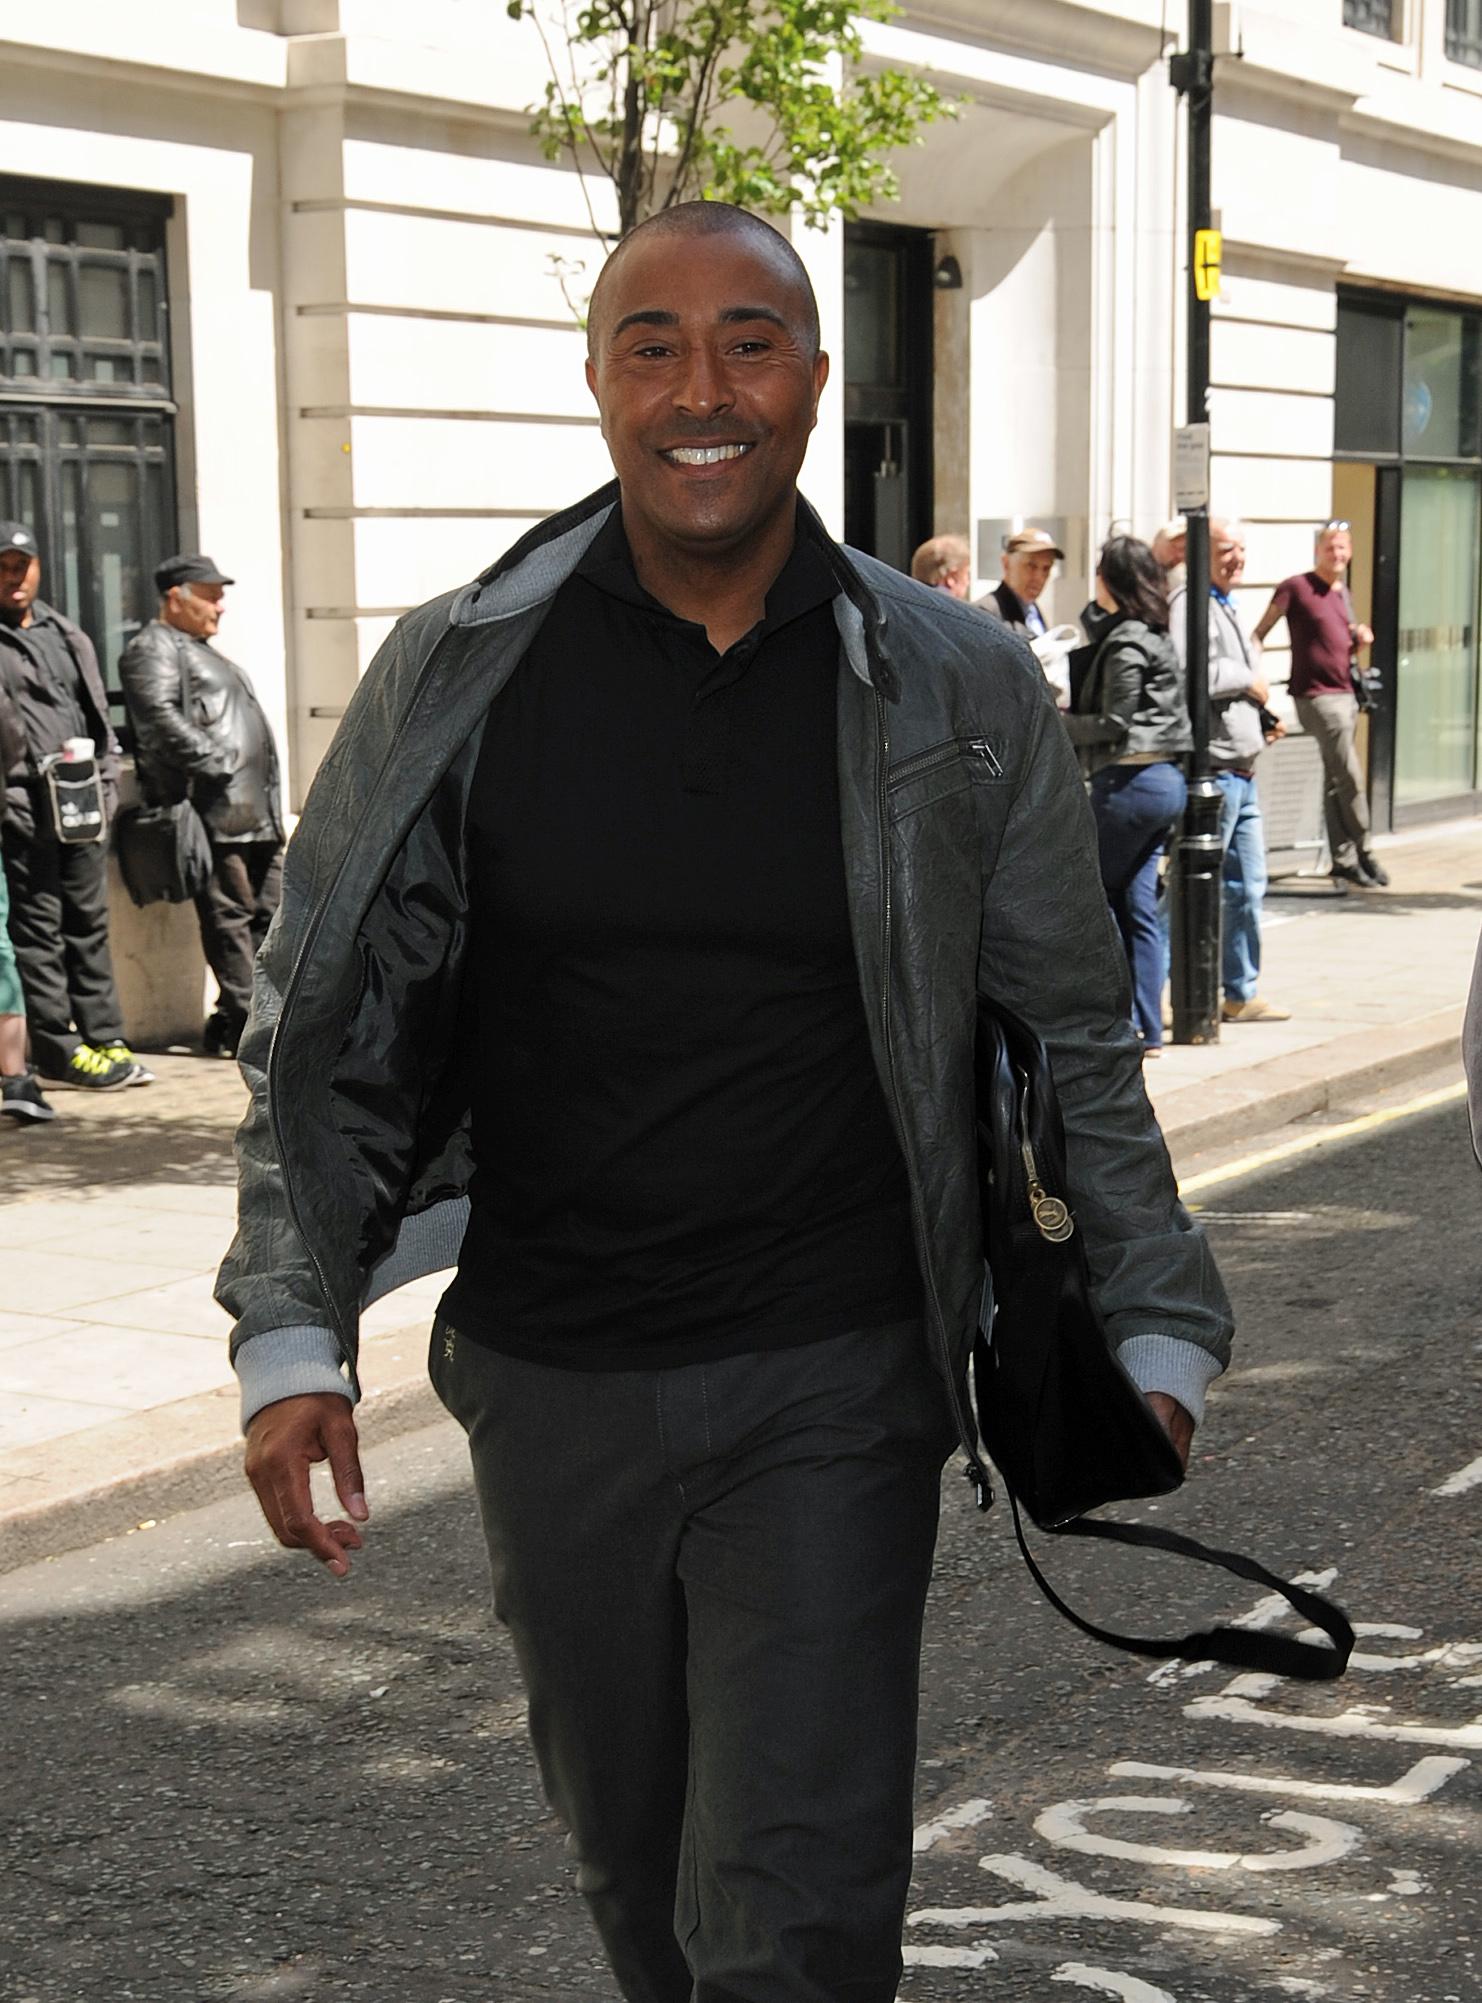 London Celebrity Sightings - June 15, 2015